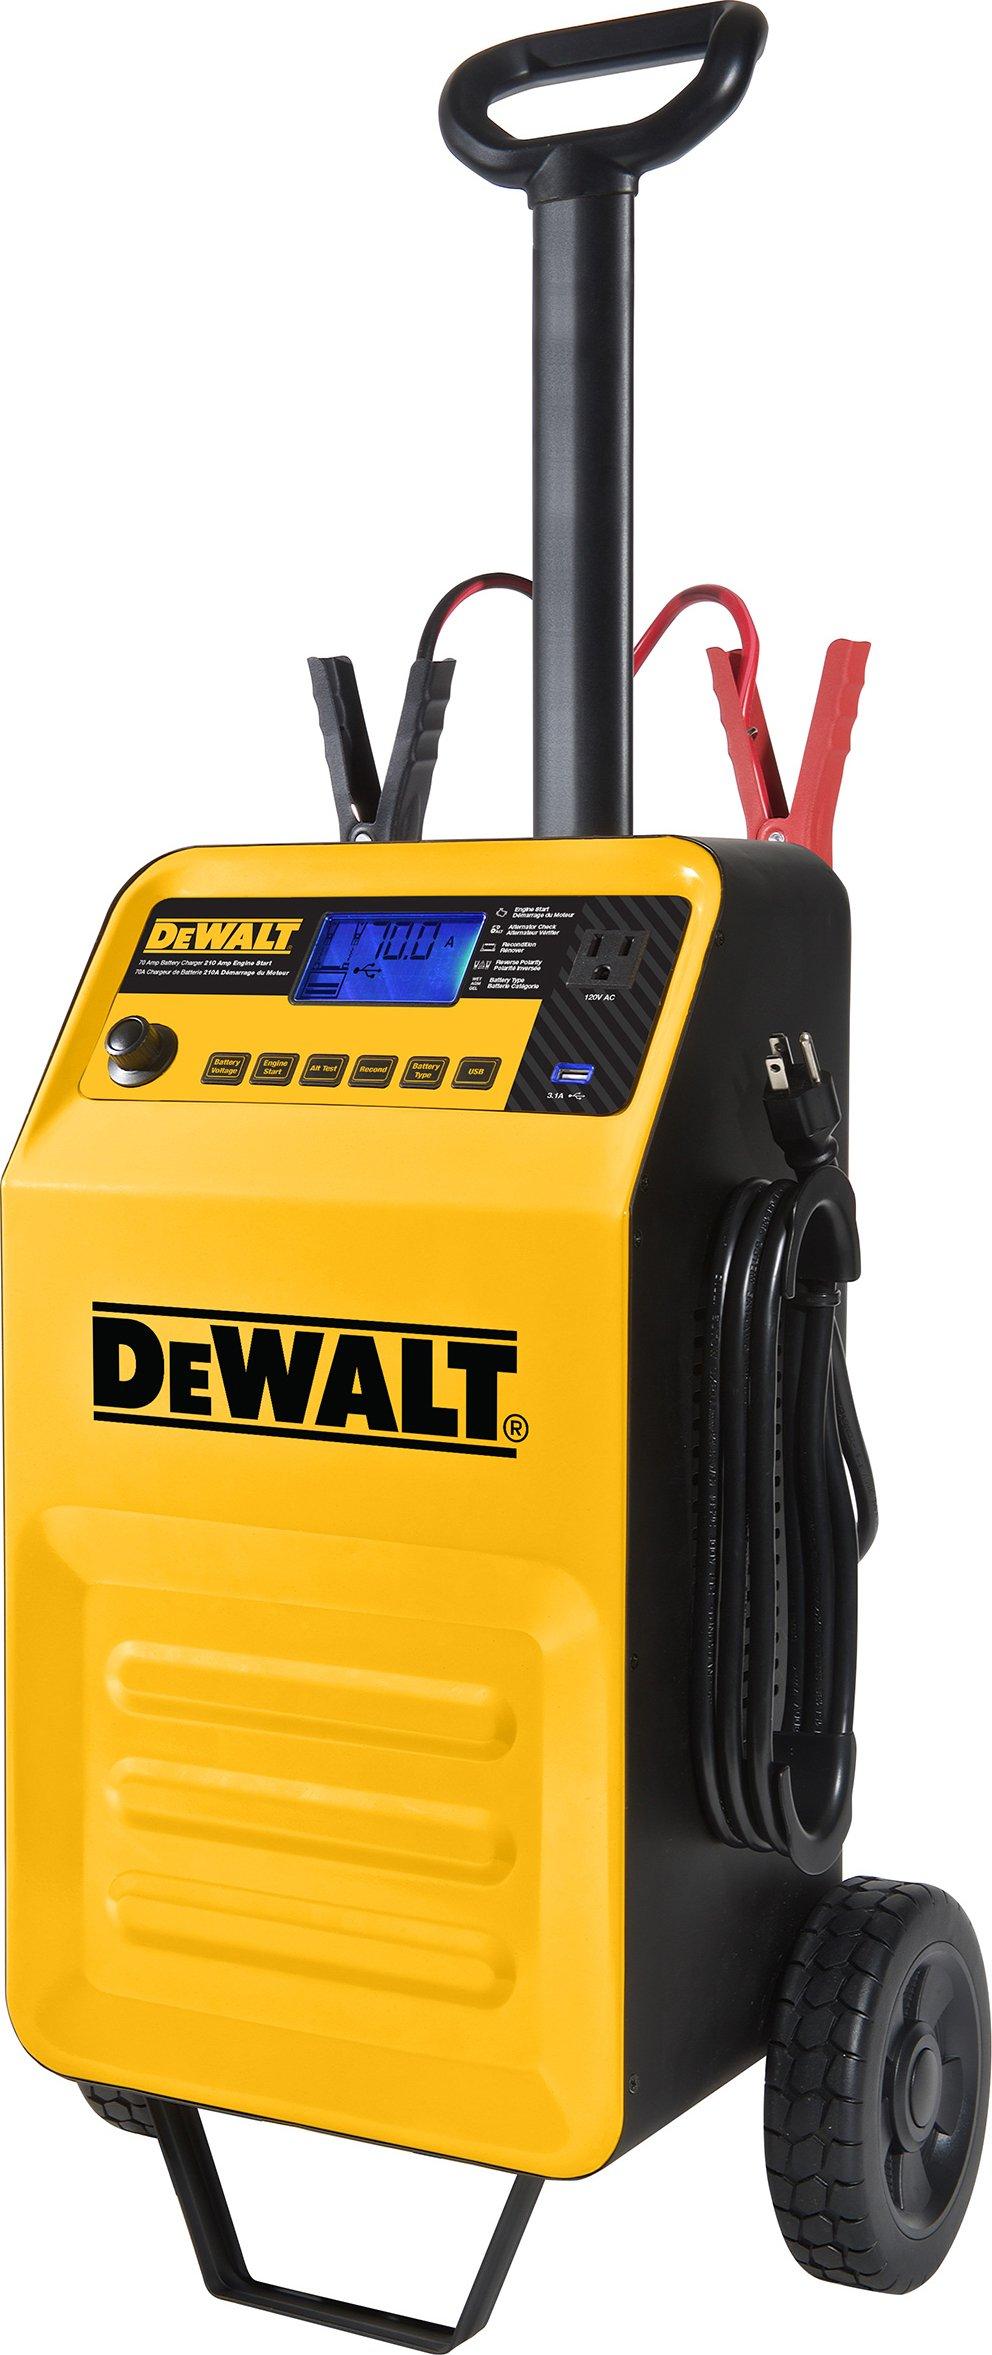 Galleon - DEWALT DXAEC210 70 Amp Rolling Battery Charger: 210 Amp